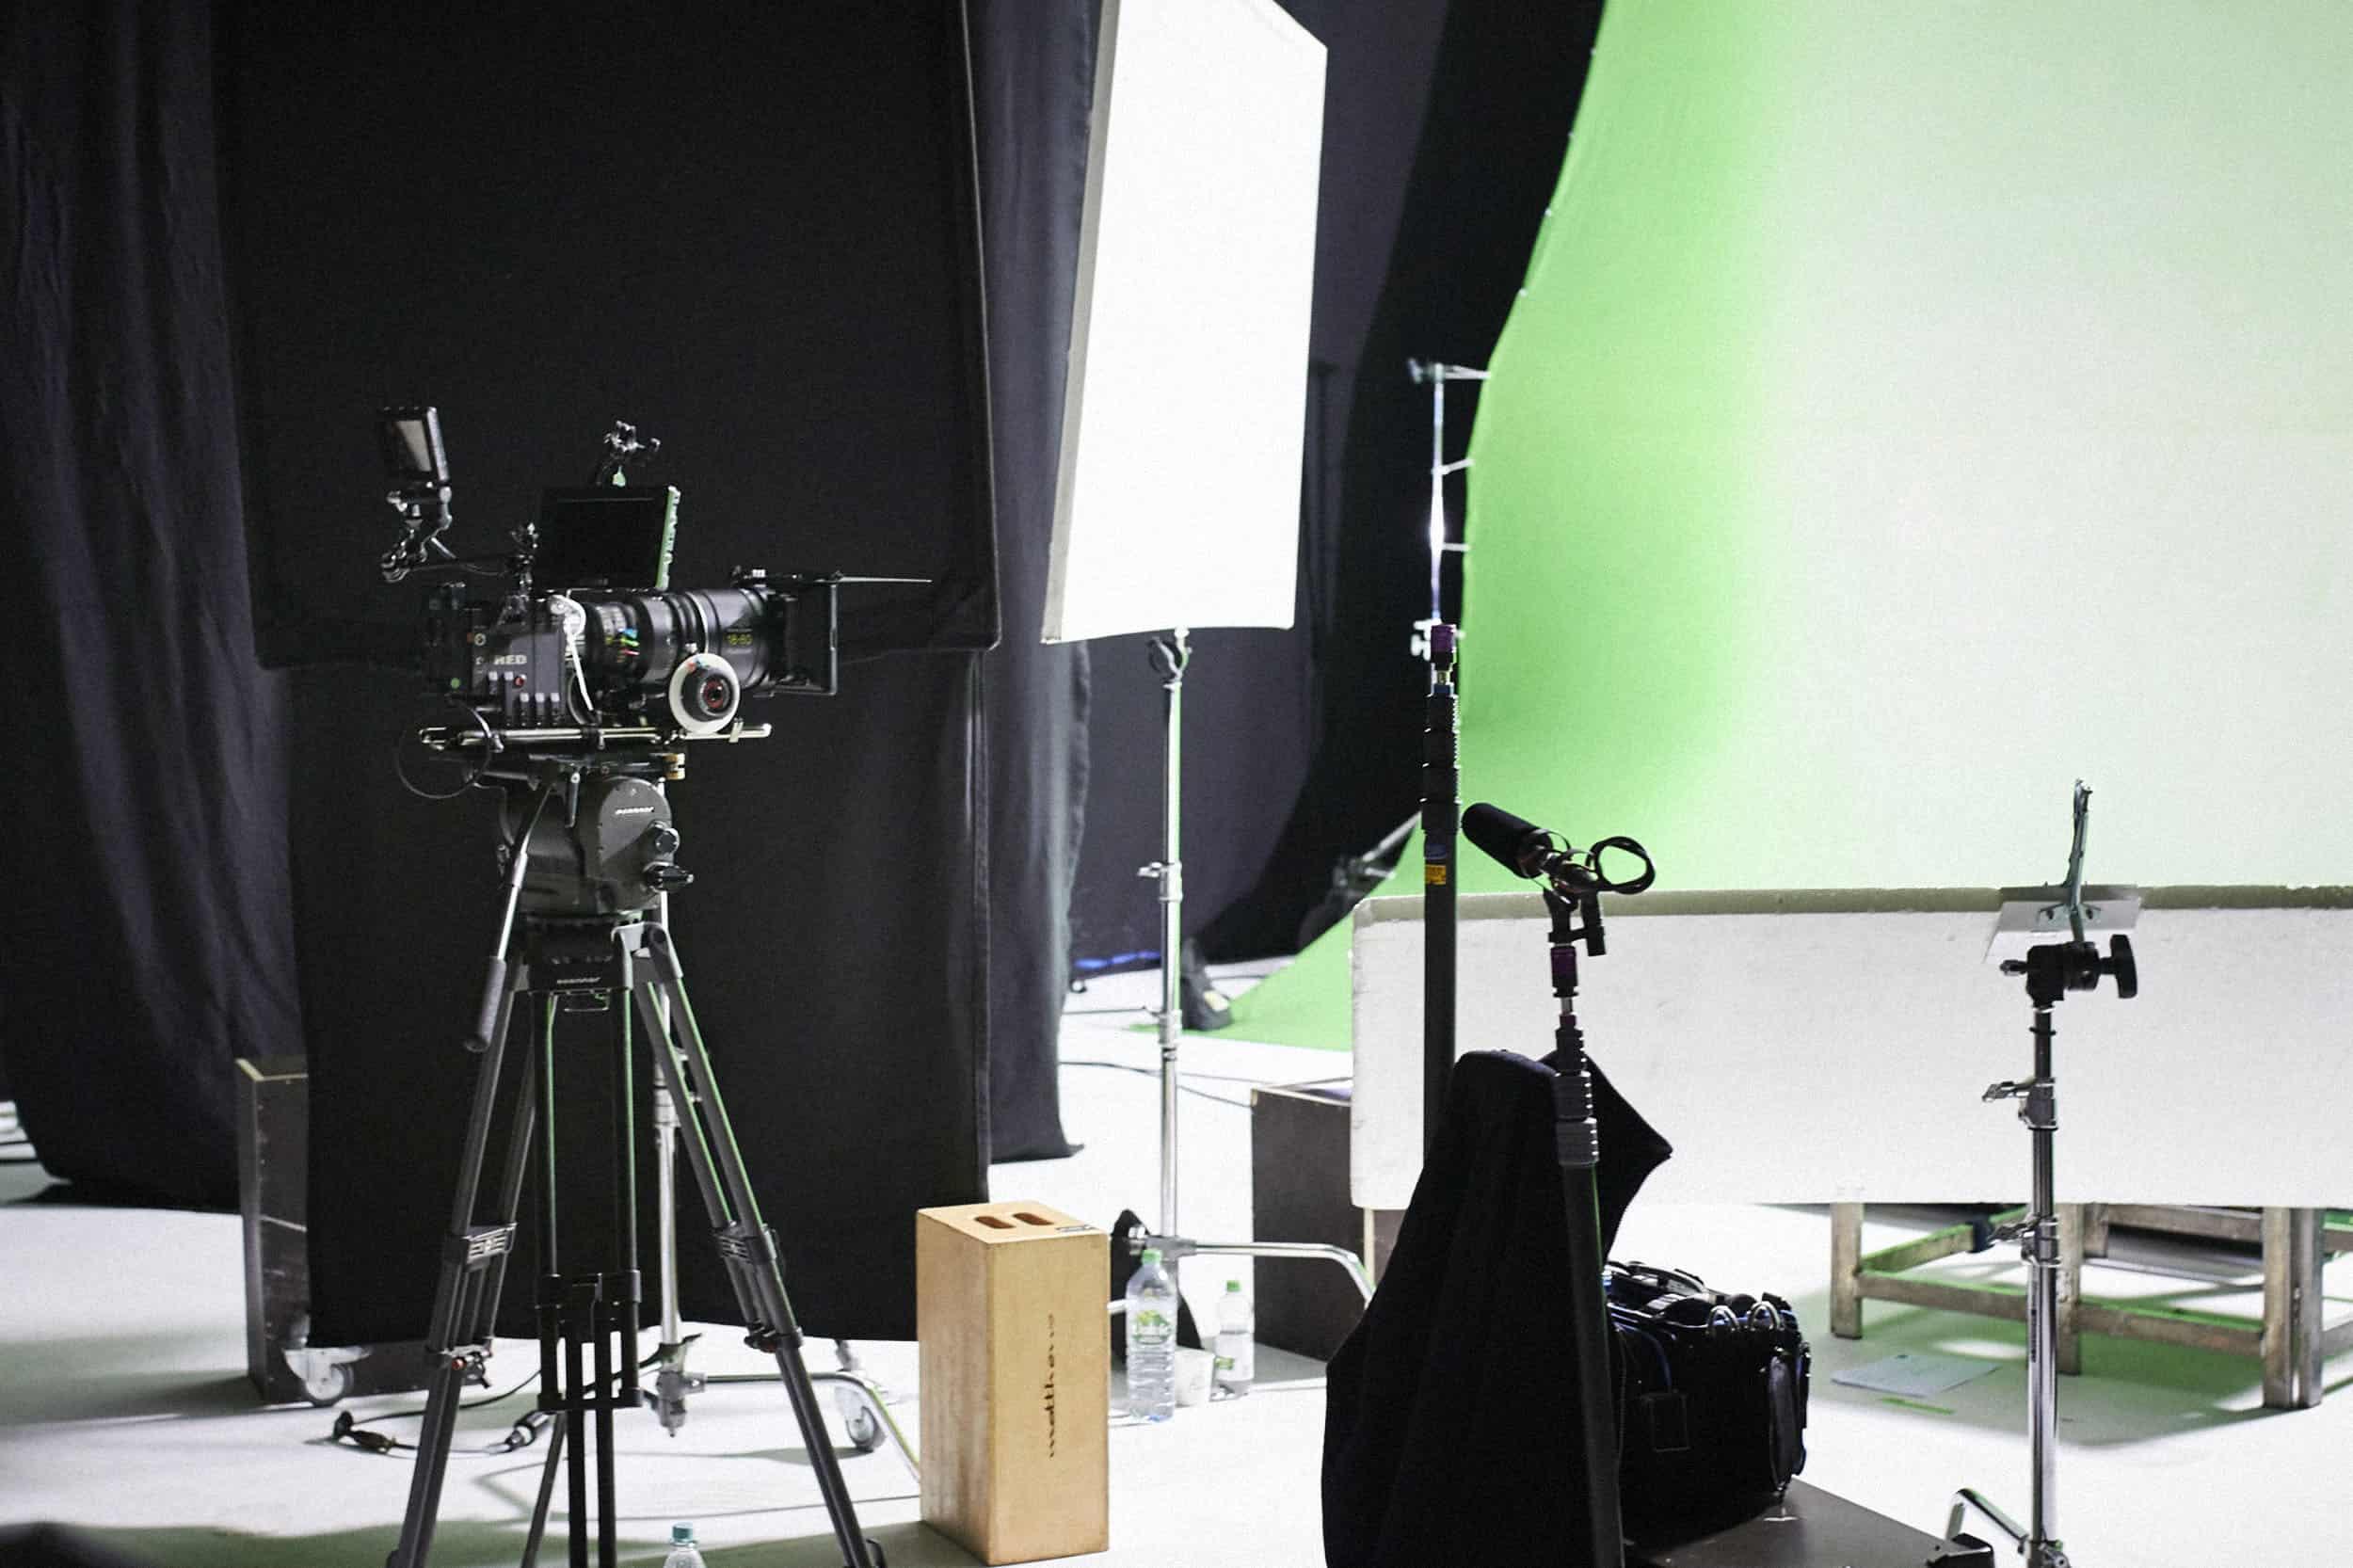 studio-ignatov-rolandversicherung-adokojo-tvcommercial-13